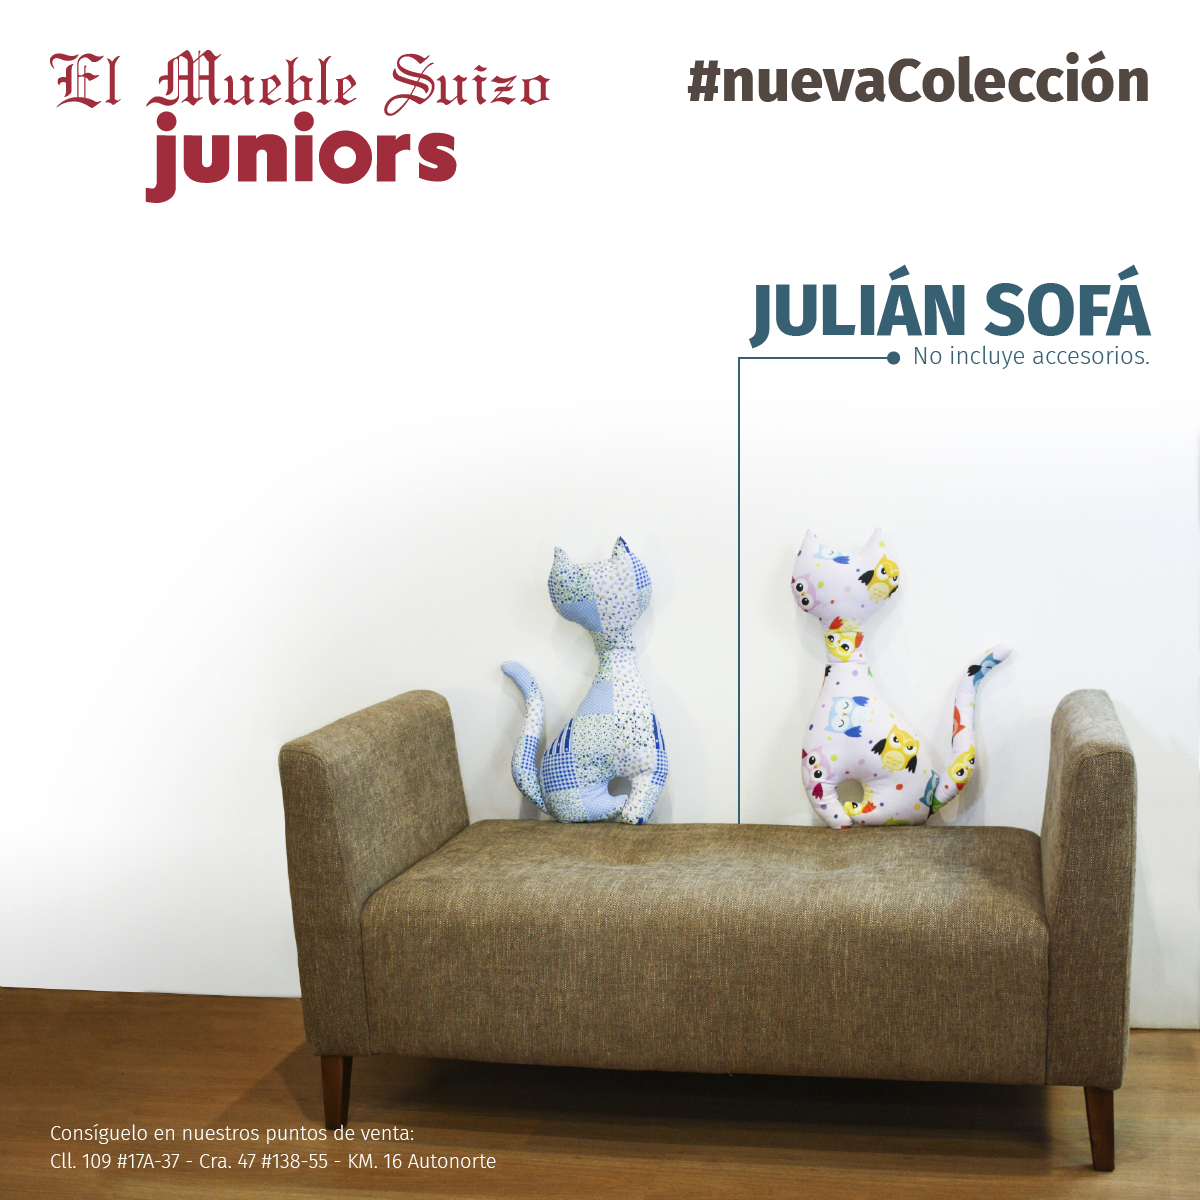 Pin By El Mueble Suizo Juniors On Poltronas Y Sof S Pinterest # Muebles Junior Suizo